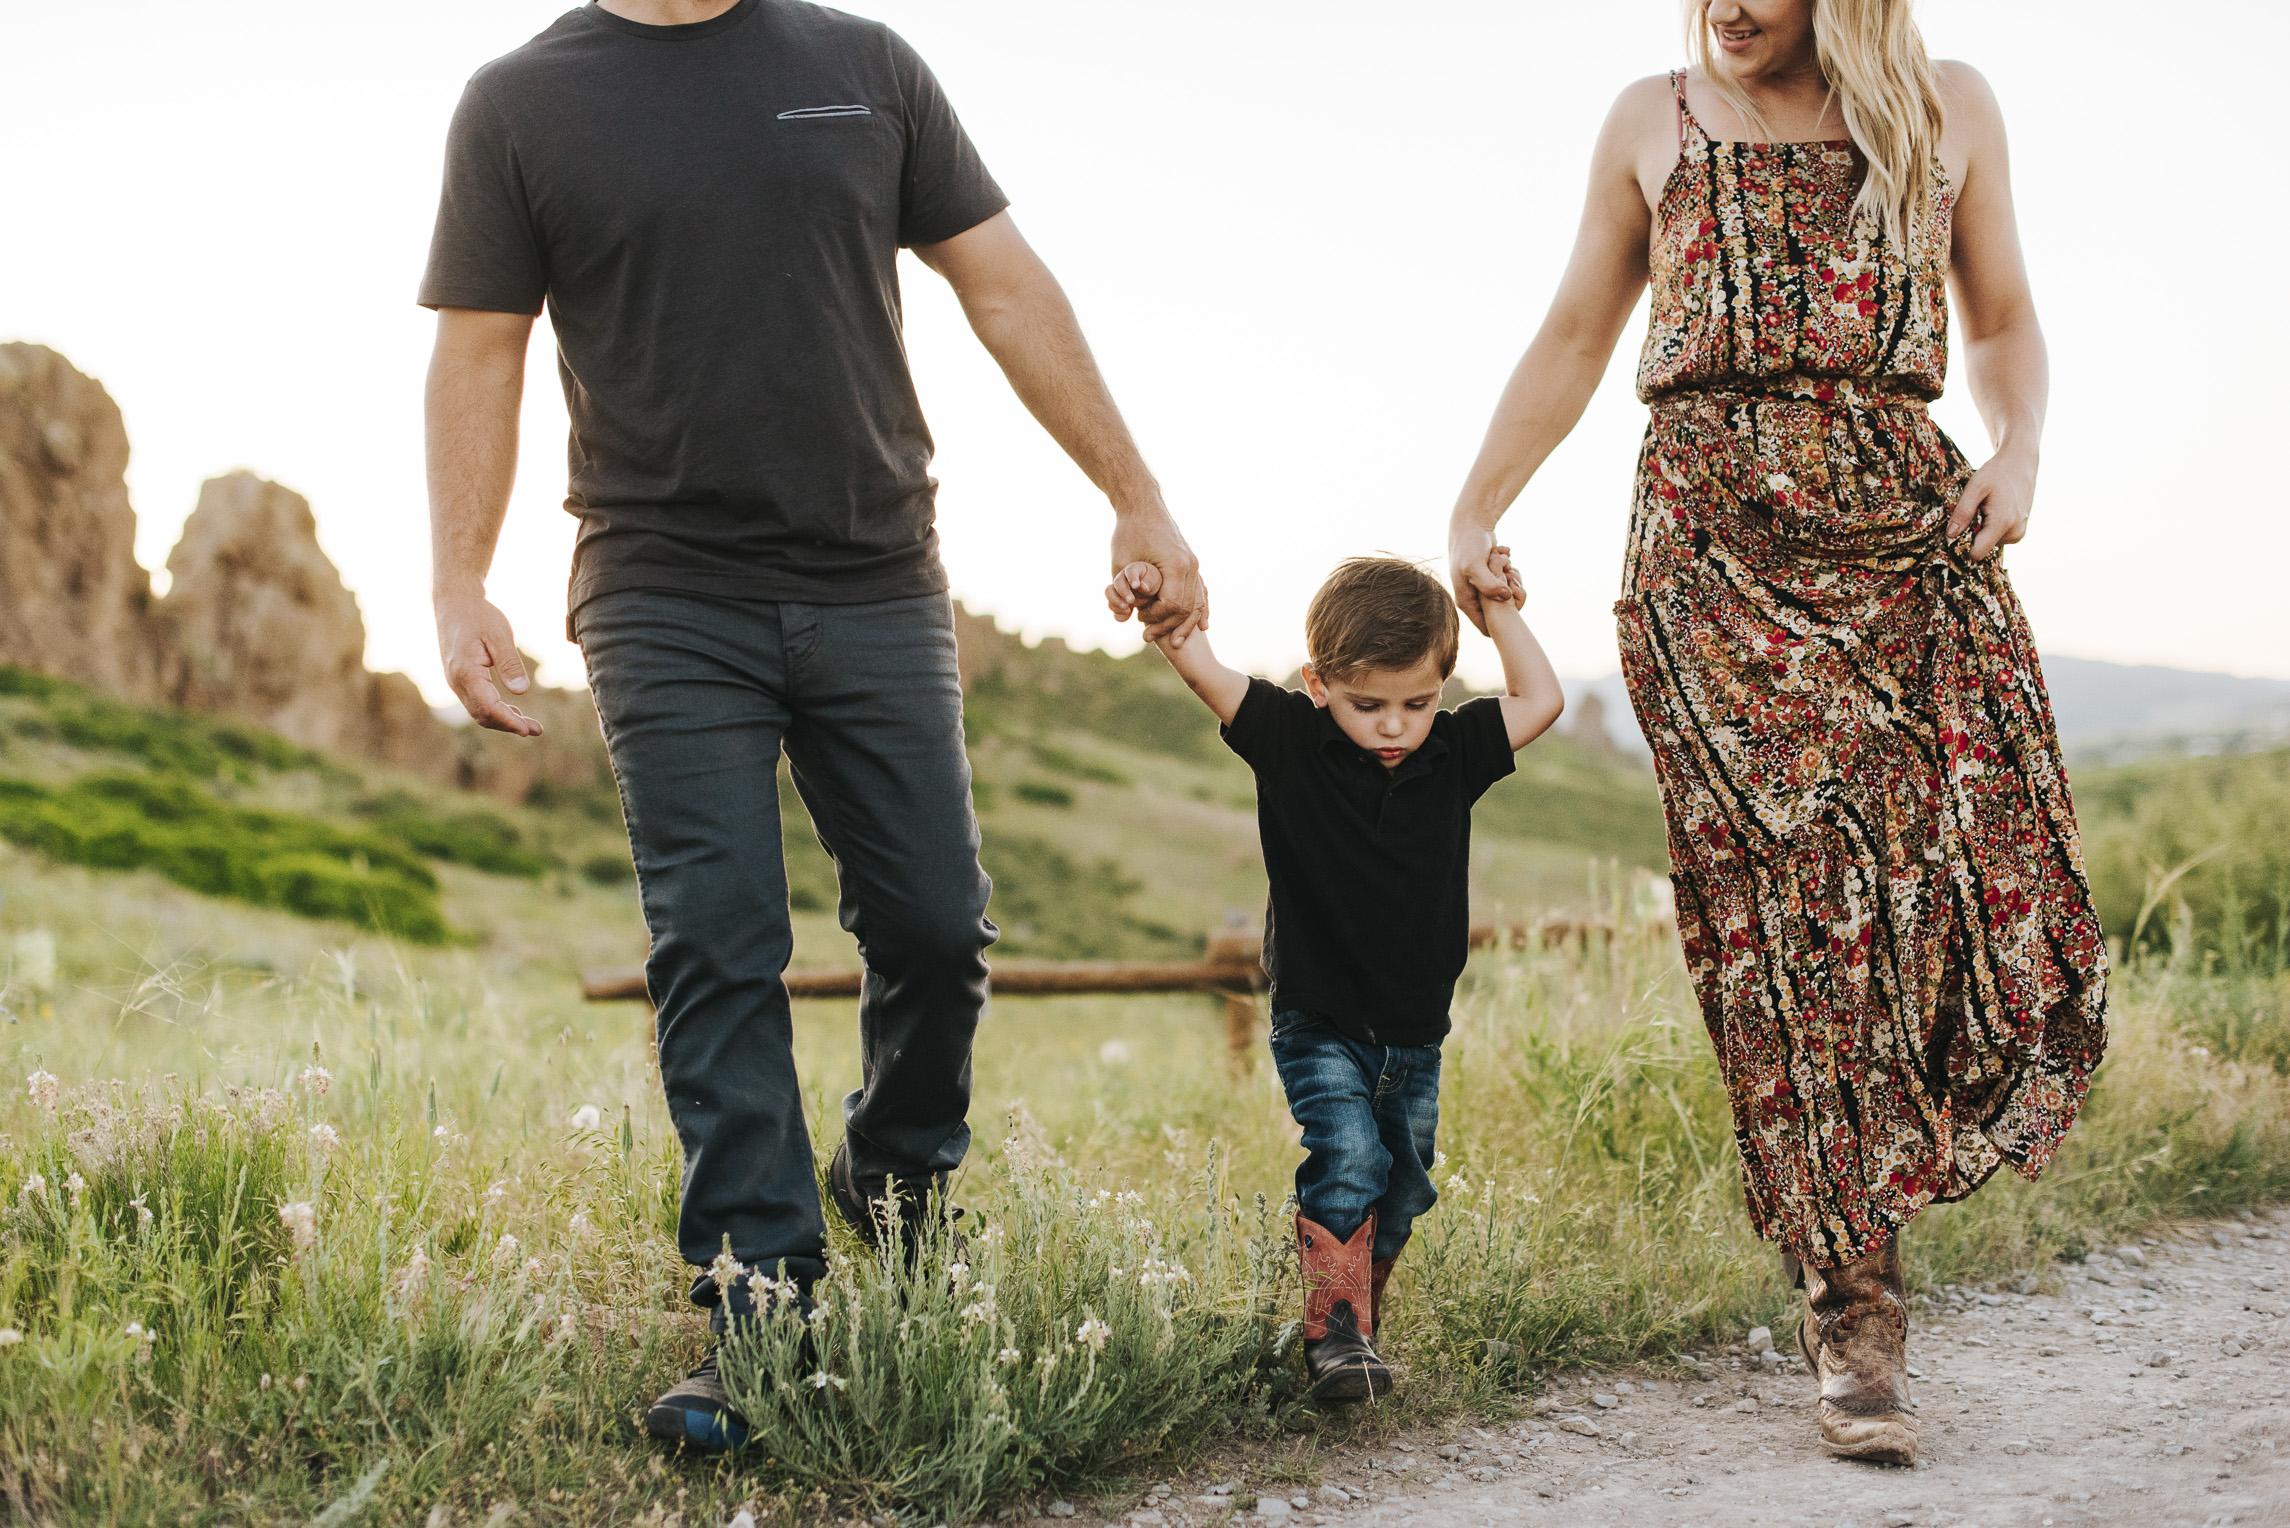 060716 webJAKE & MCKENNA FAMILY PHOTOS - COLORADO PHOTOGRAPHER - DEBI RAE PHOTOGRAPHY-5653.jpg